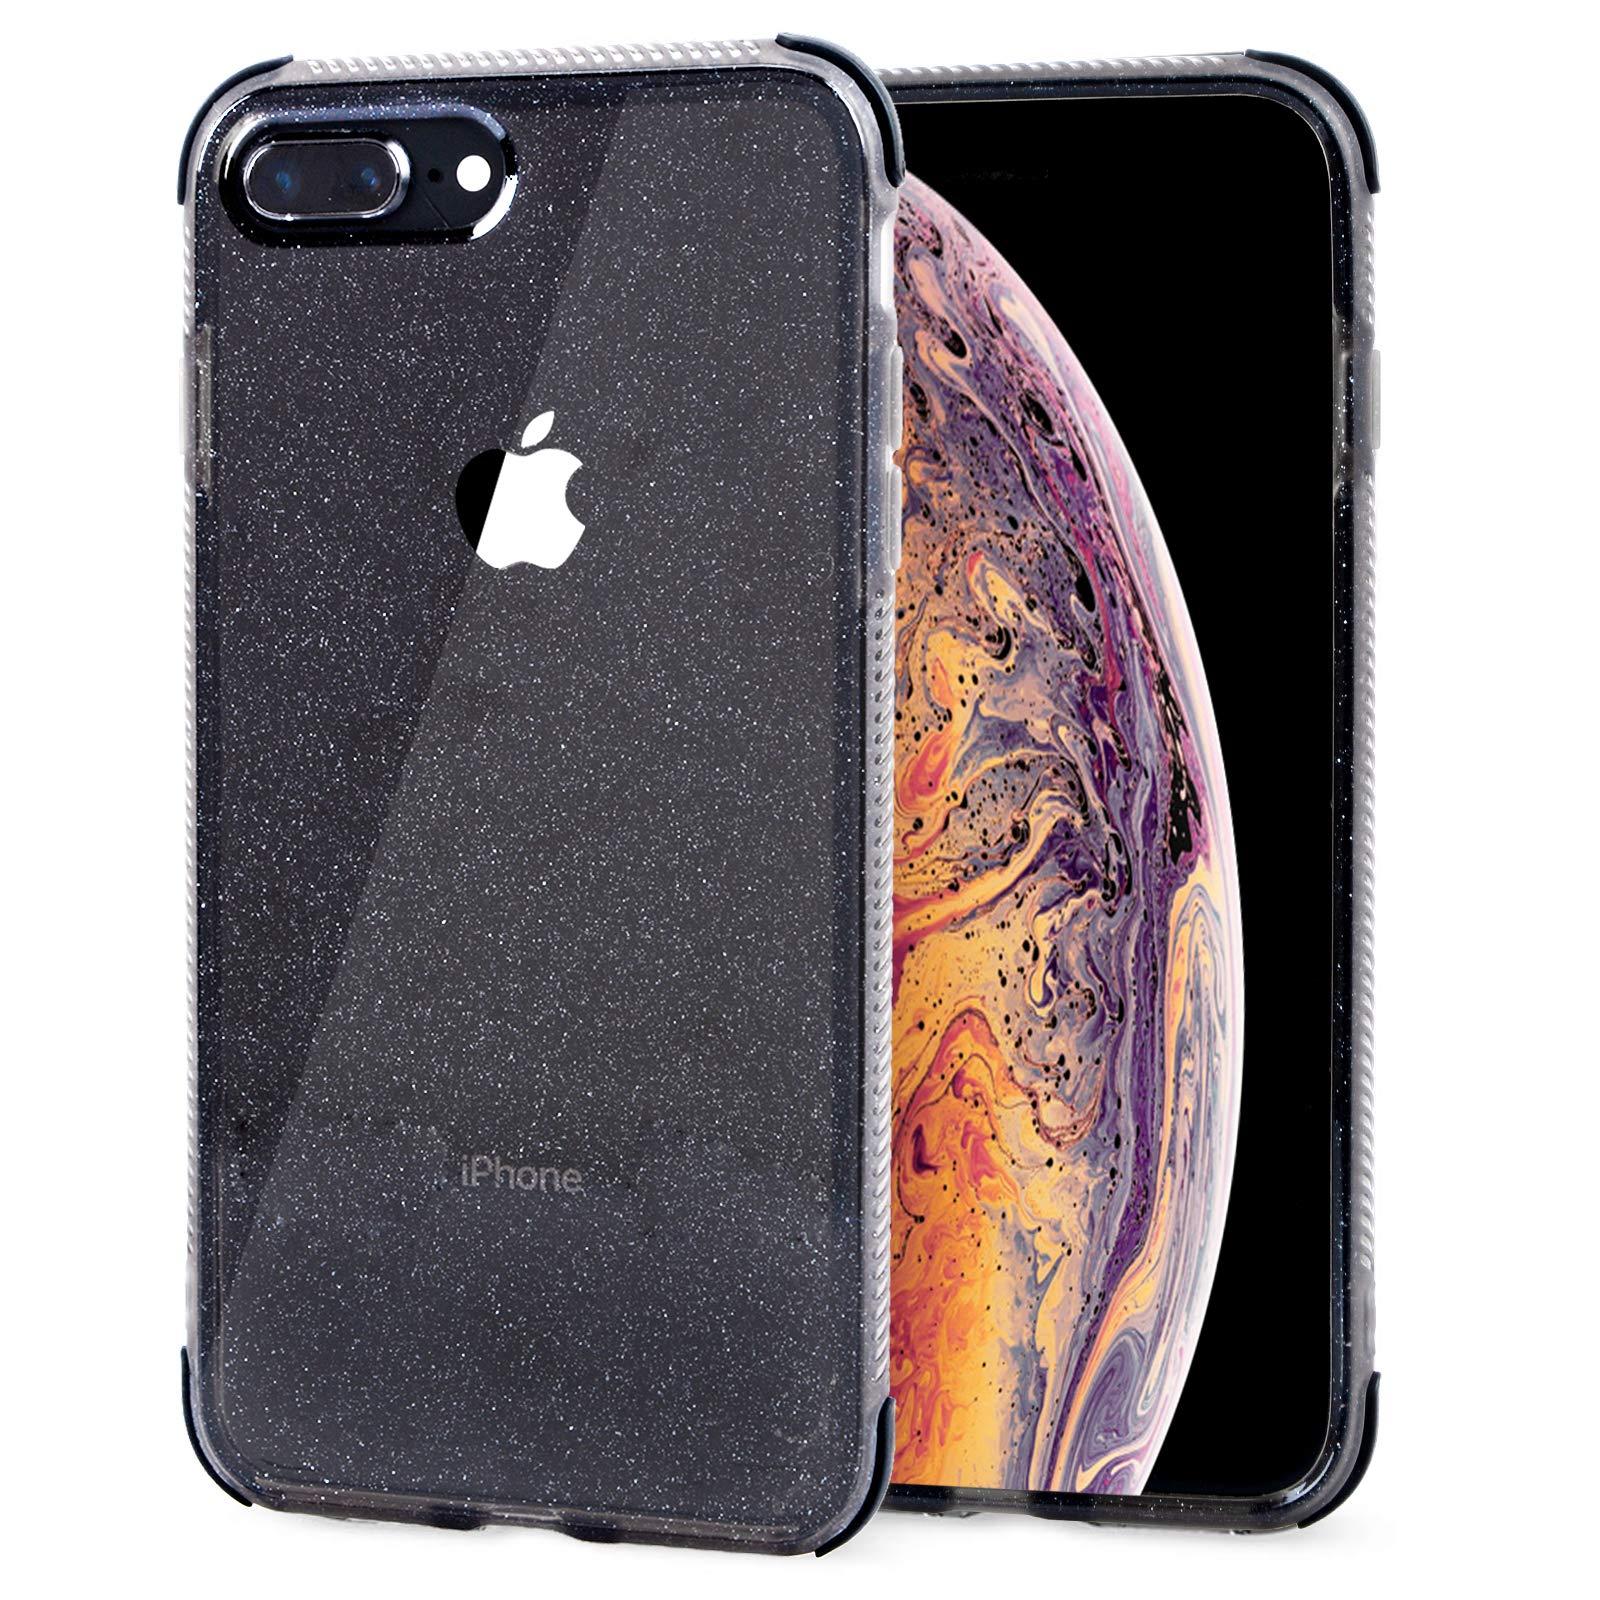 Voilamart iPhone 7 Plus Case, iPhone 8 Plus Case Bling Shiny Cute Pattern Design Sparkle Glitter Anti-Slick/Protective Case for iPhone 7/8 Plus 5.5 Inch, Black